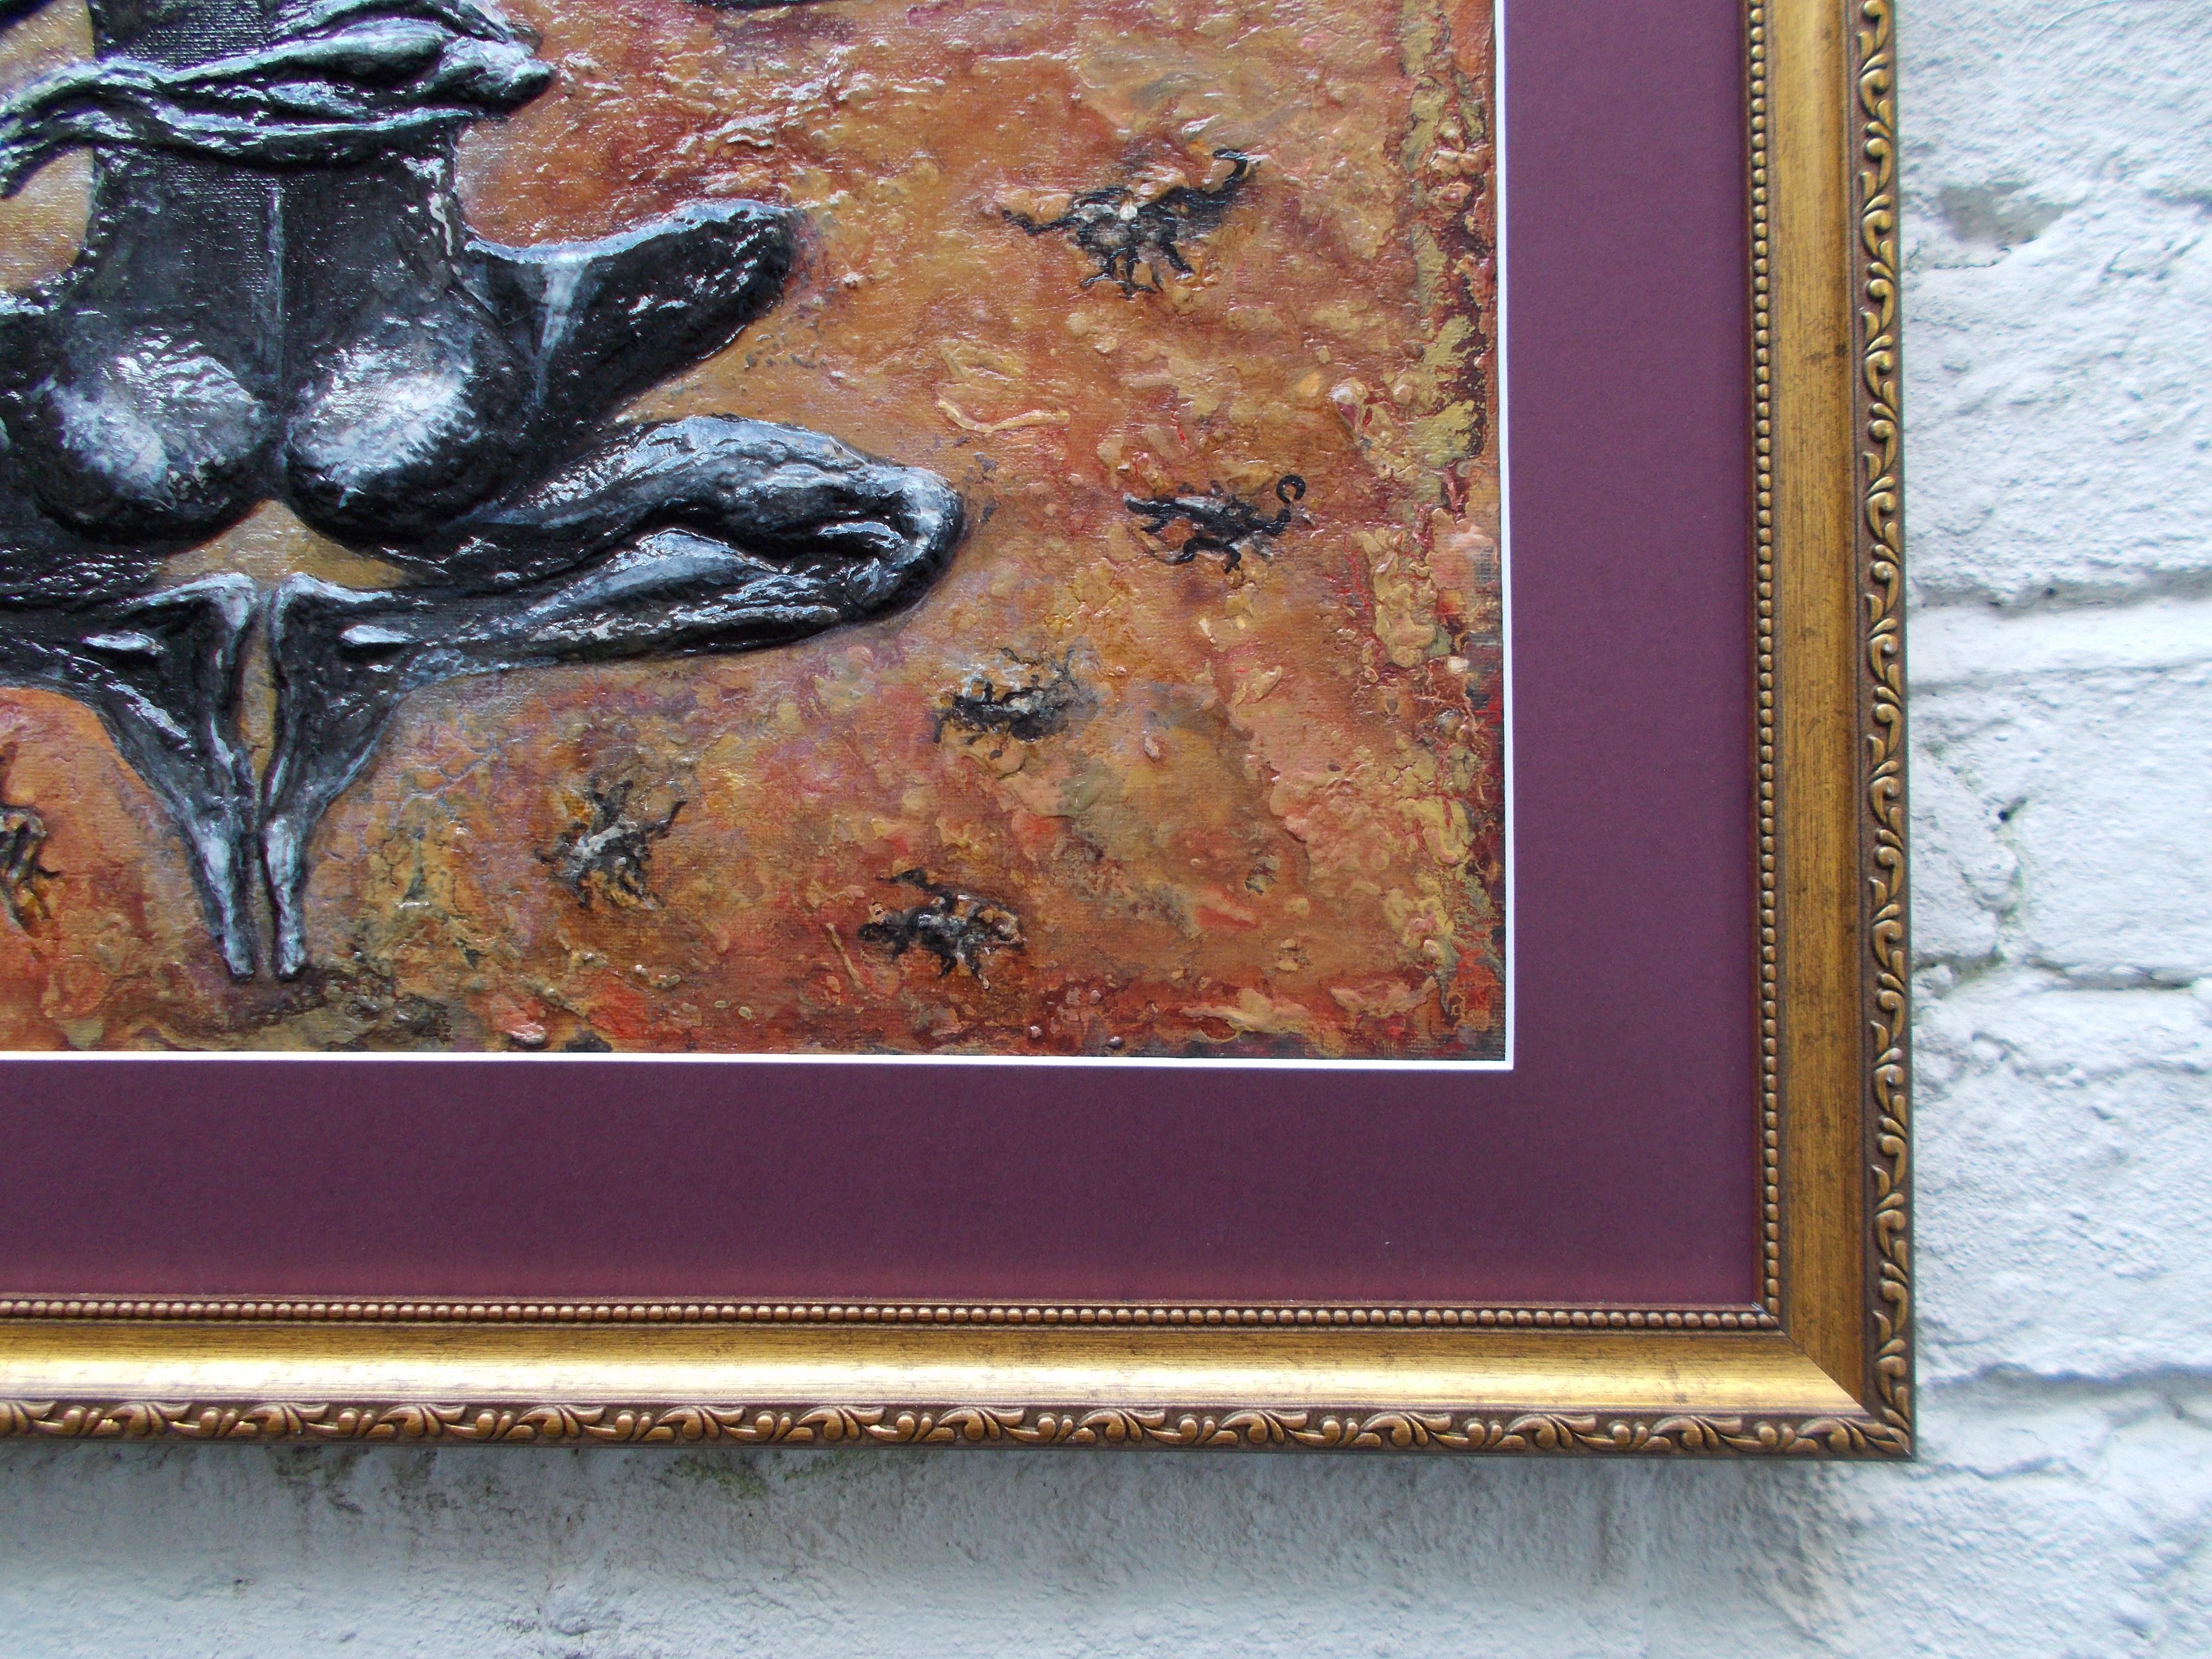 Scorpio-The-Scorpion-Oct 23-Nov 21-Jurita-2019-Painting Relief 3D-mixed-media-acrylic-clay-40x50cm© (16)